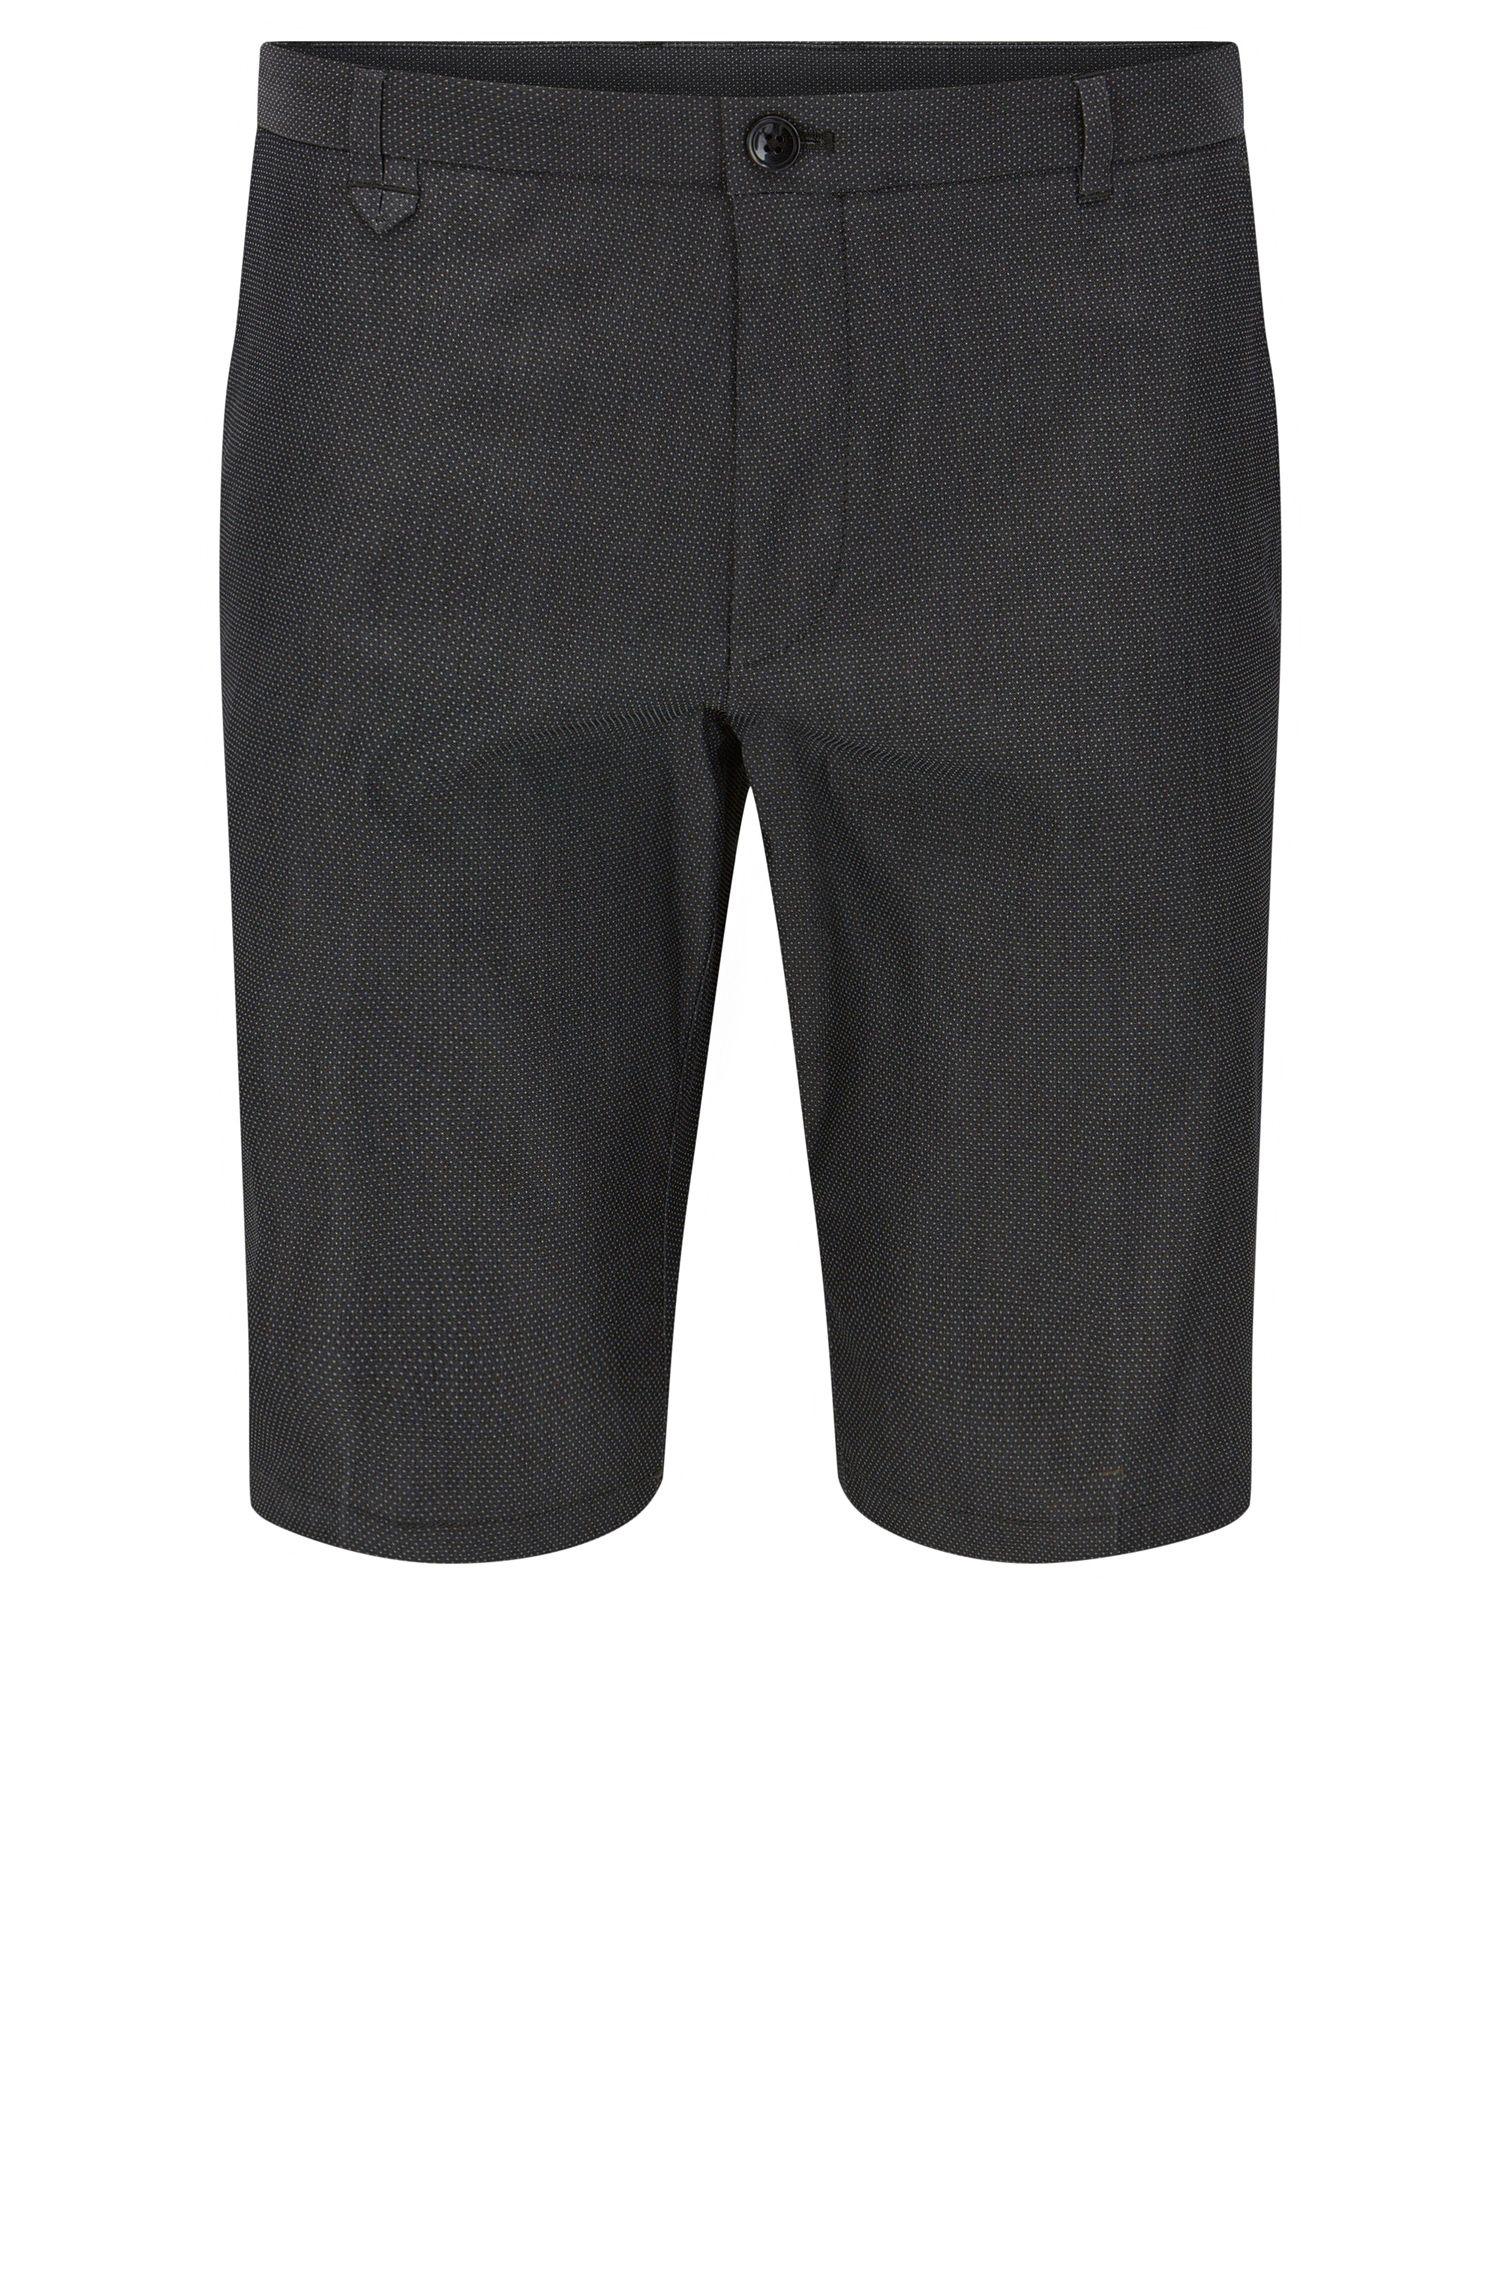 'Hano3' | Slim Fit, Pindot Stretch Cotton Blend Short